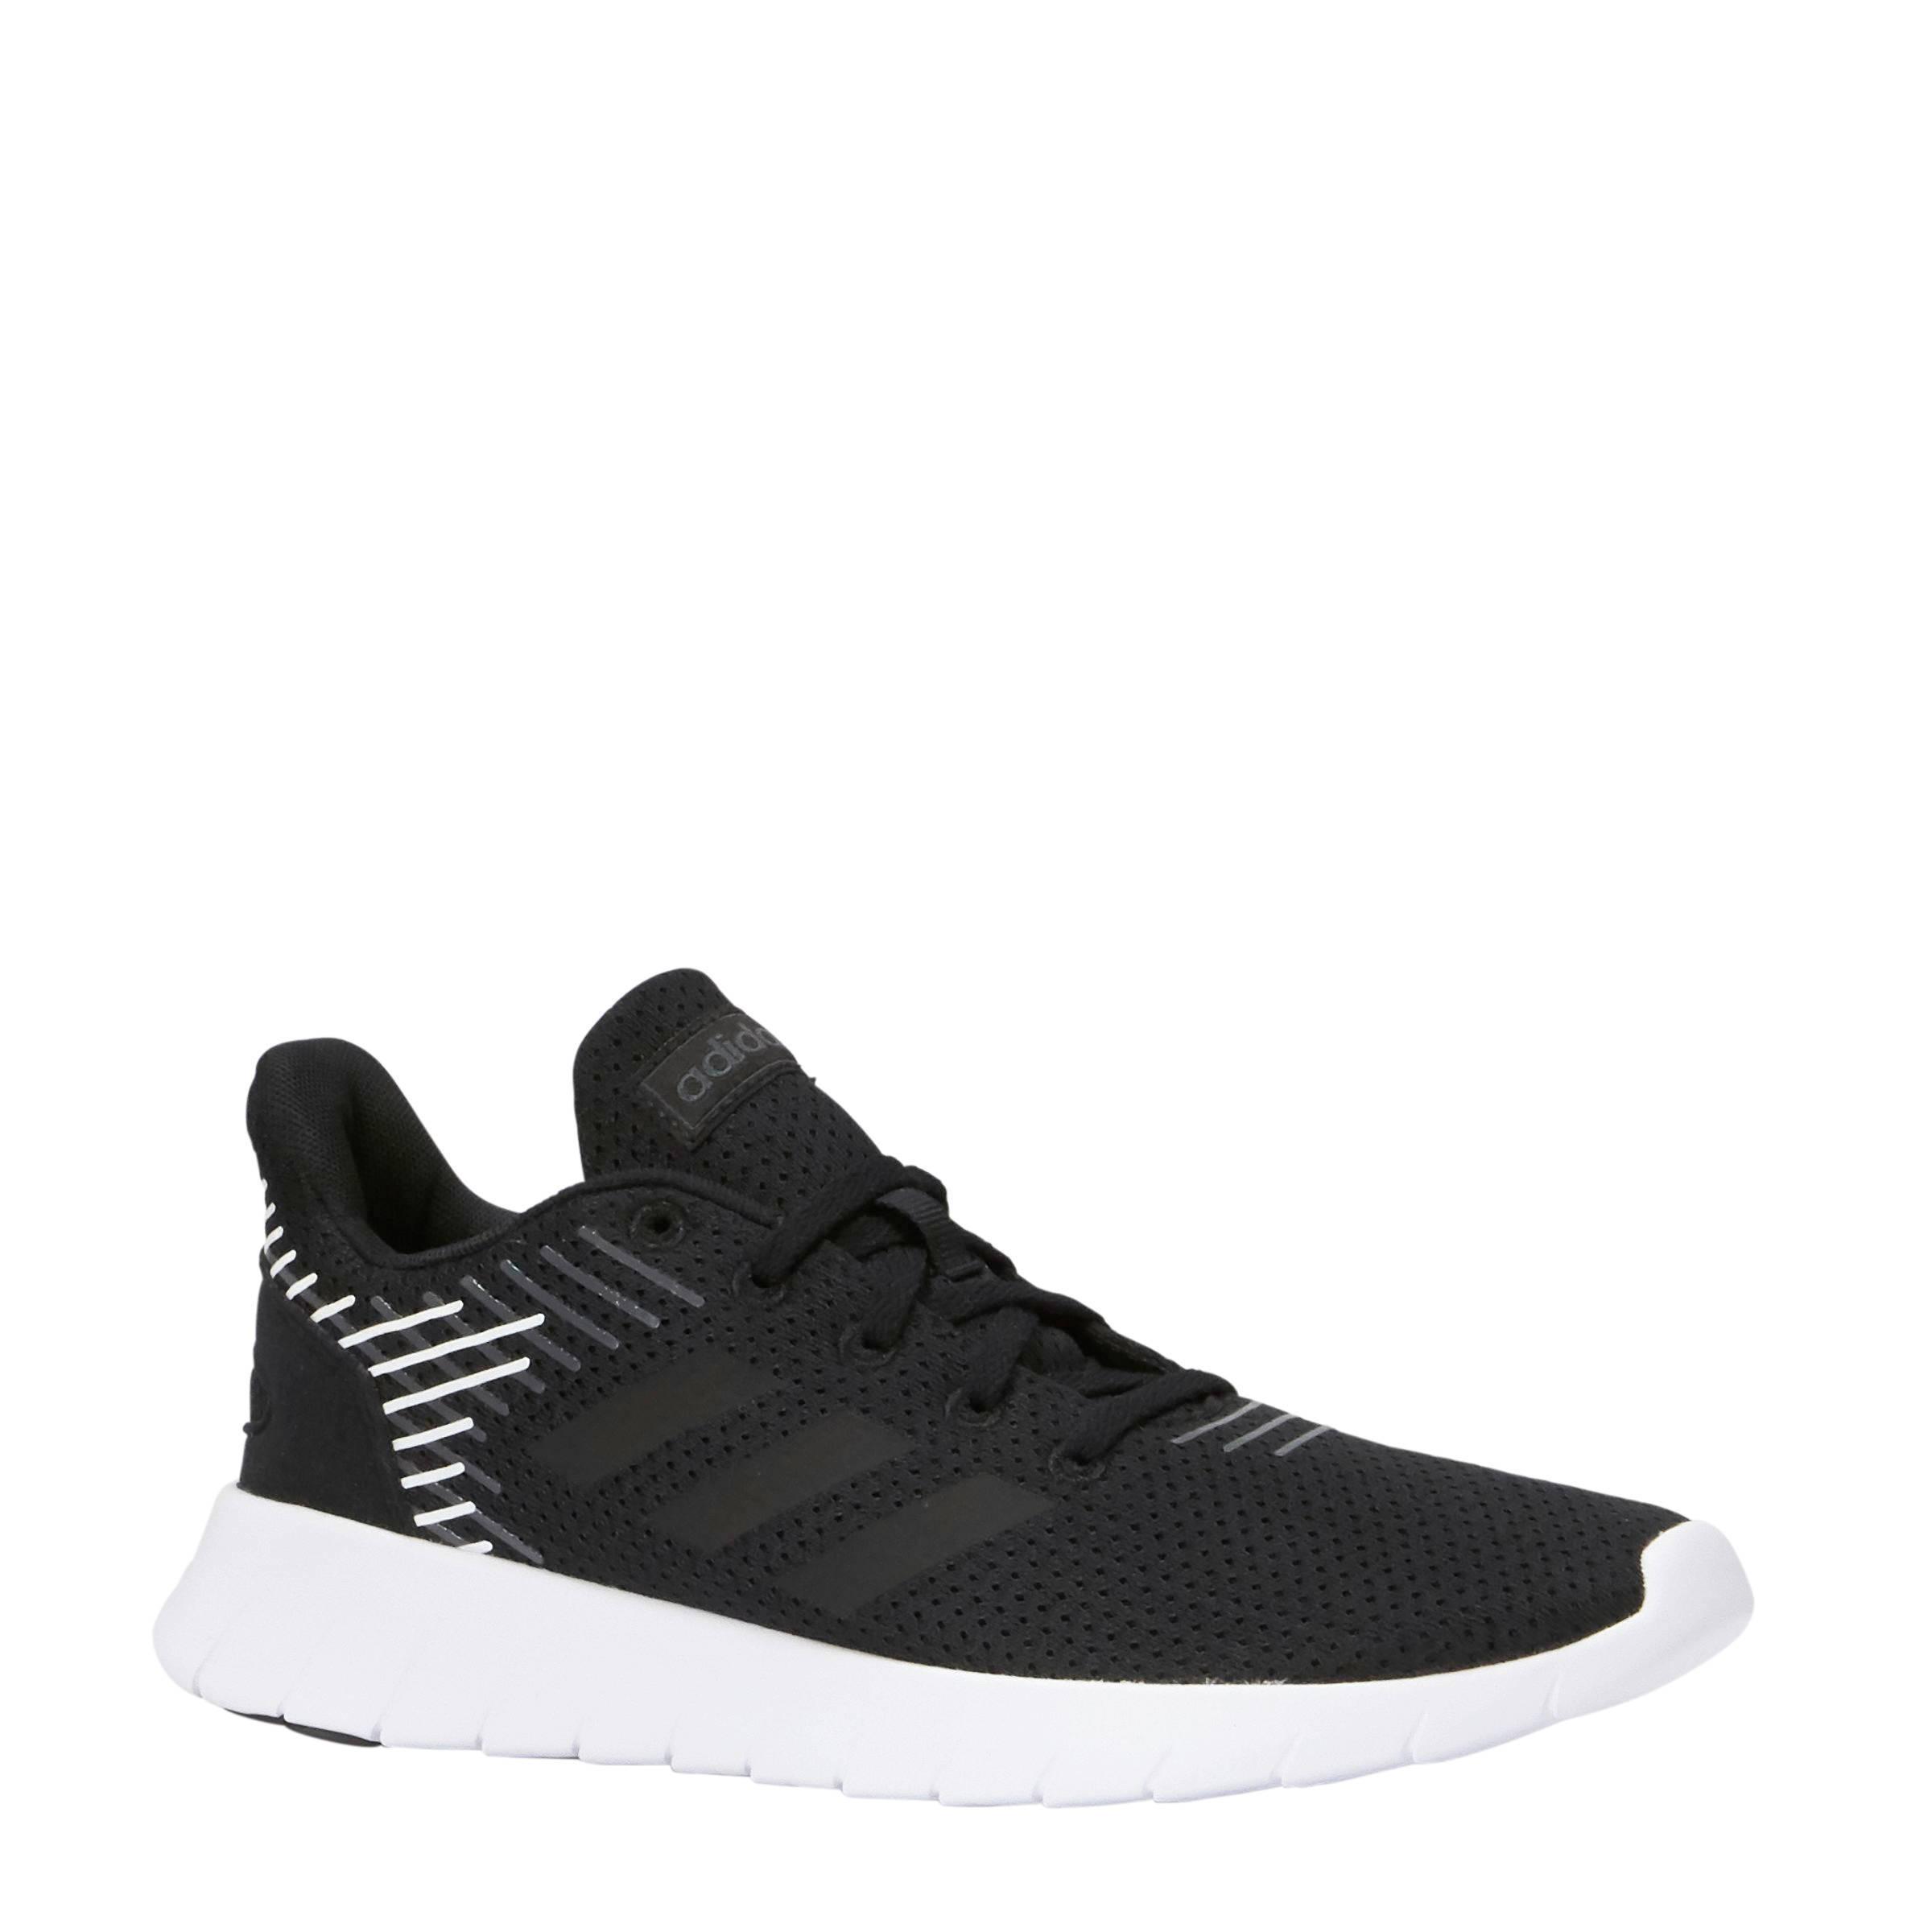 adidas Performance Asweerun hardloopschoenen zwart/wit | wehkamp